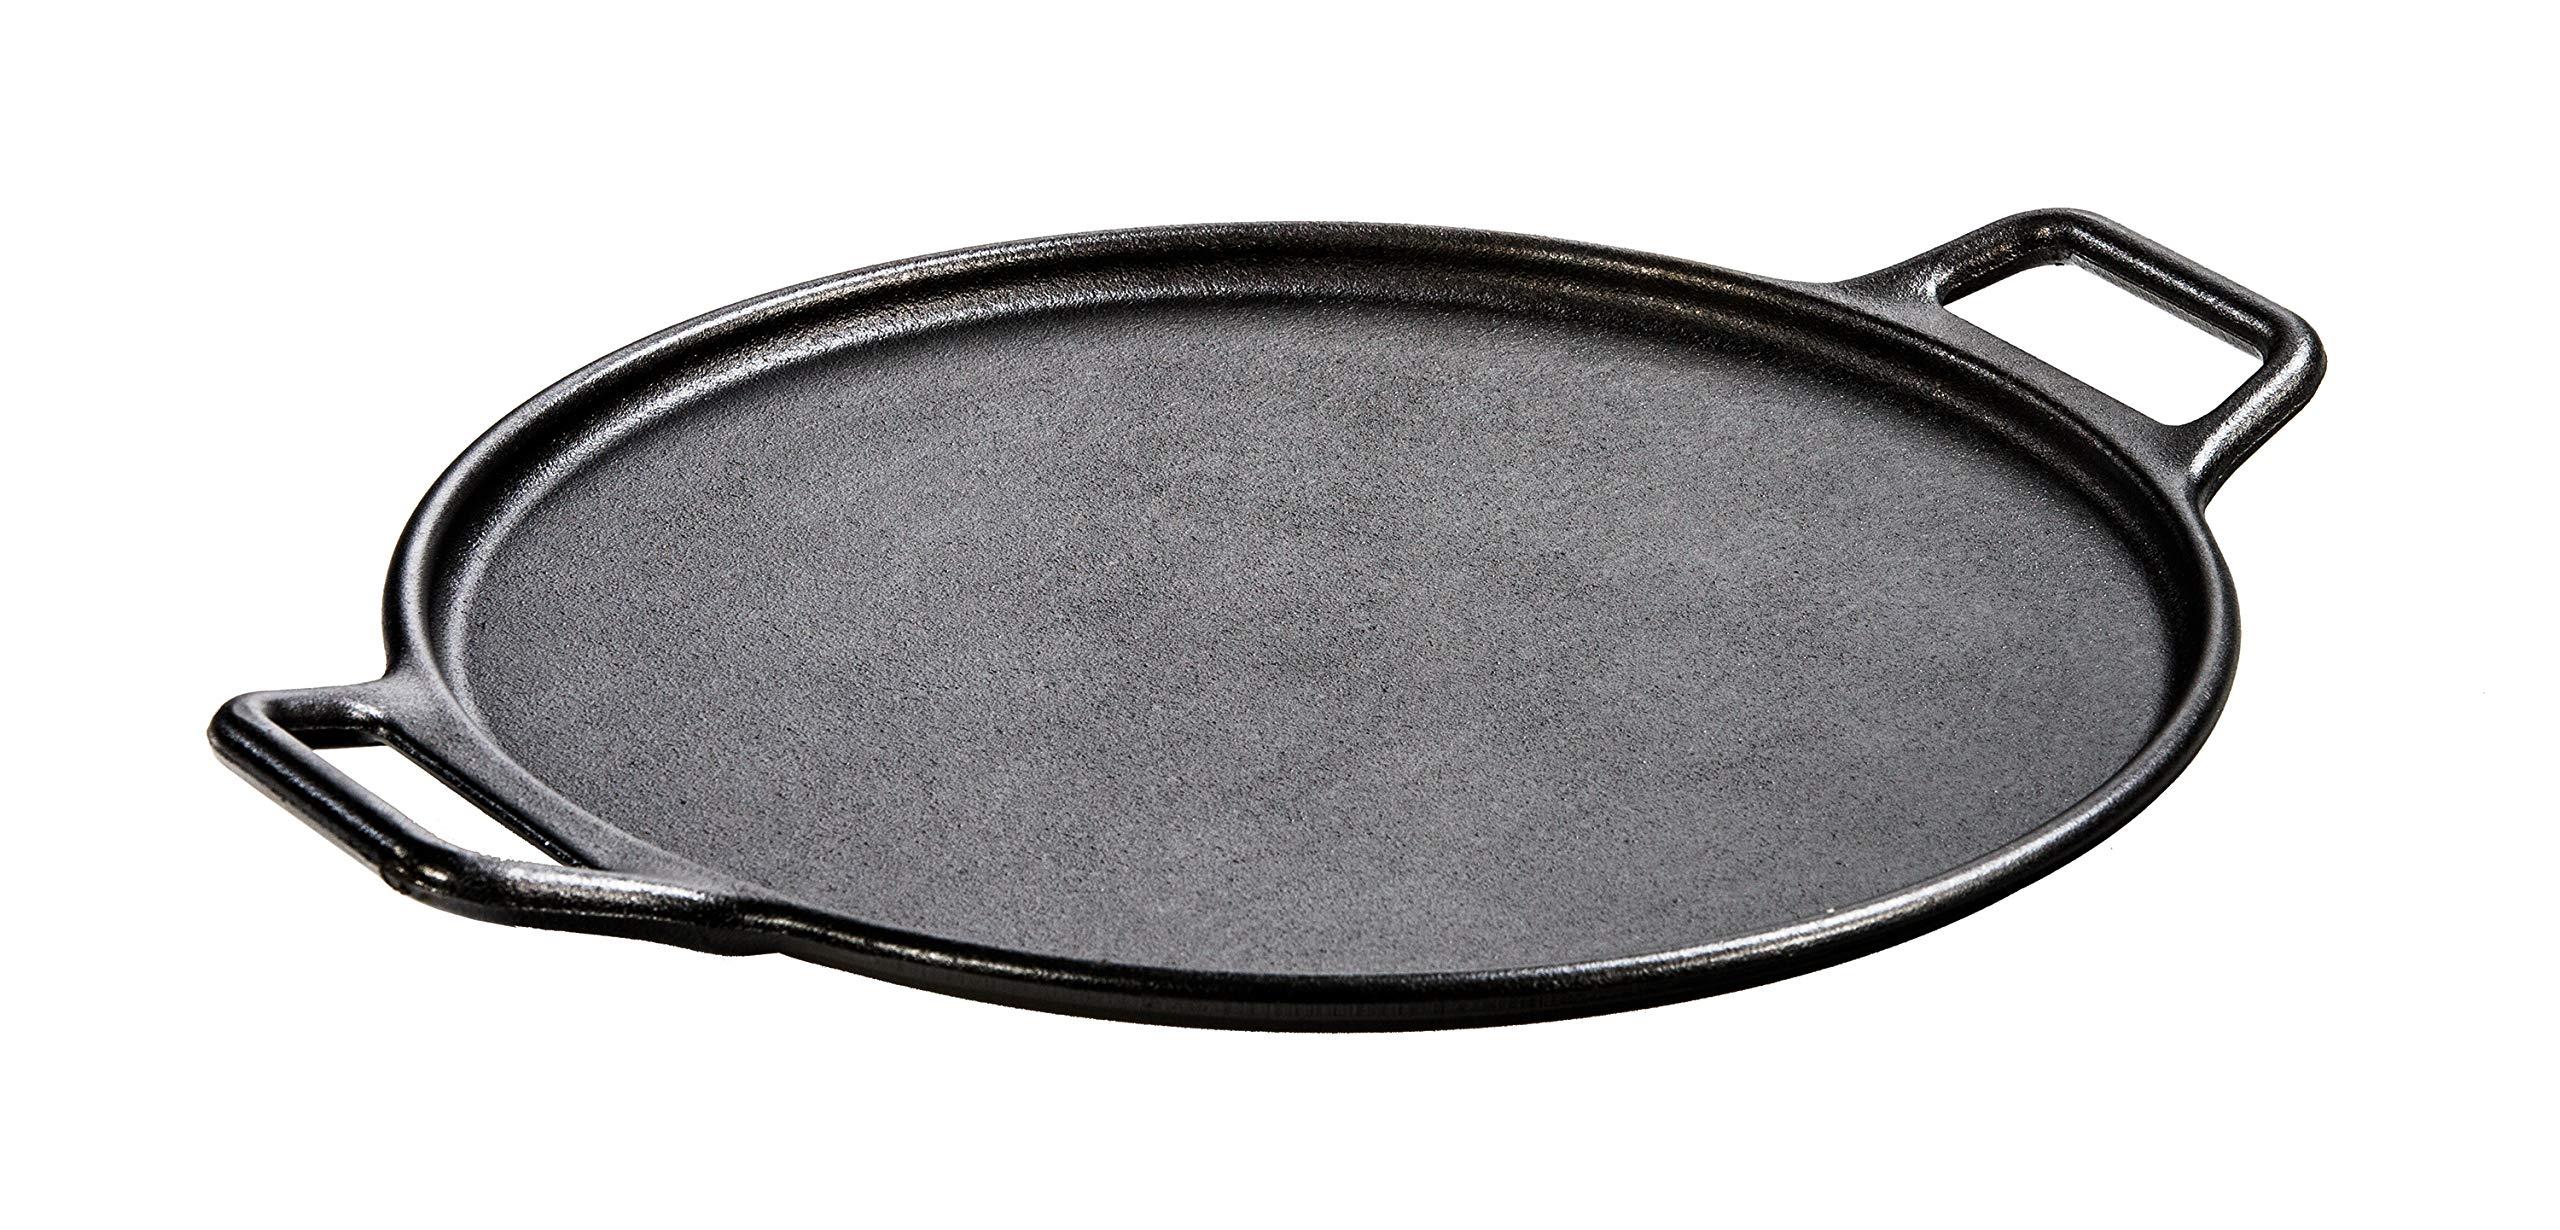 Lodge P14P3 Pro-Logic Cast Iron Pizza Pan, 14-inch, Black by Lodge